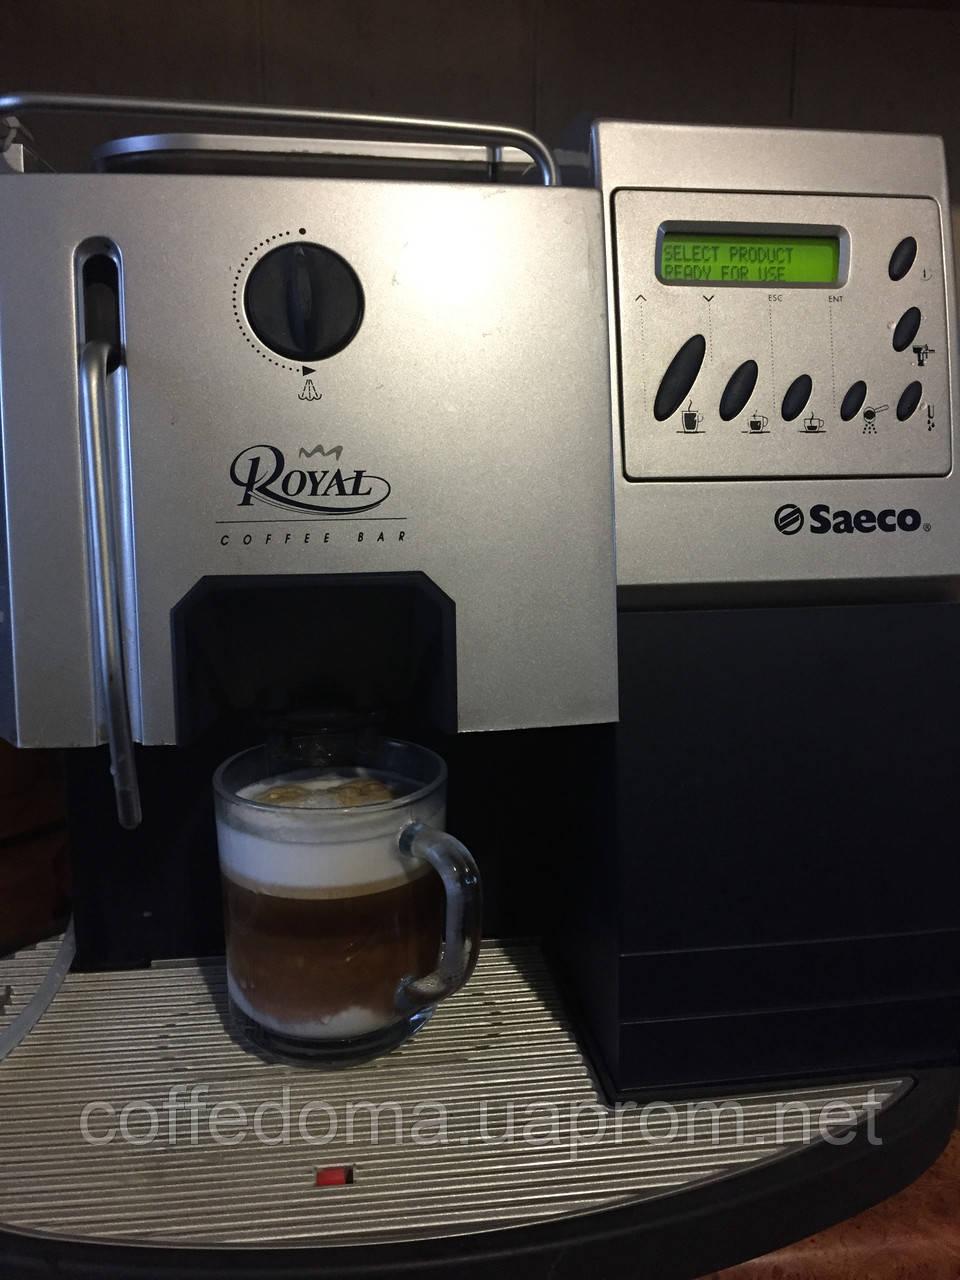 Saeco Coffe bar (Saeco Royal Cappuccino) автоматическая кофемашина